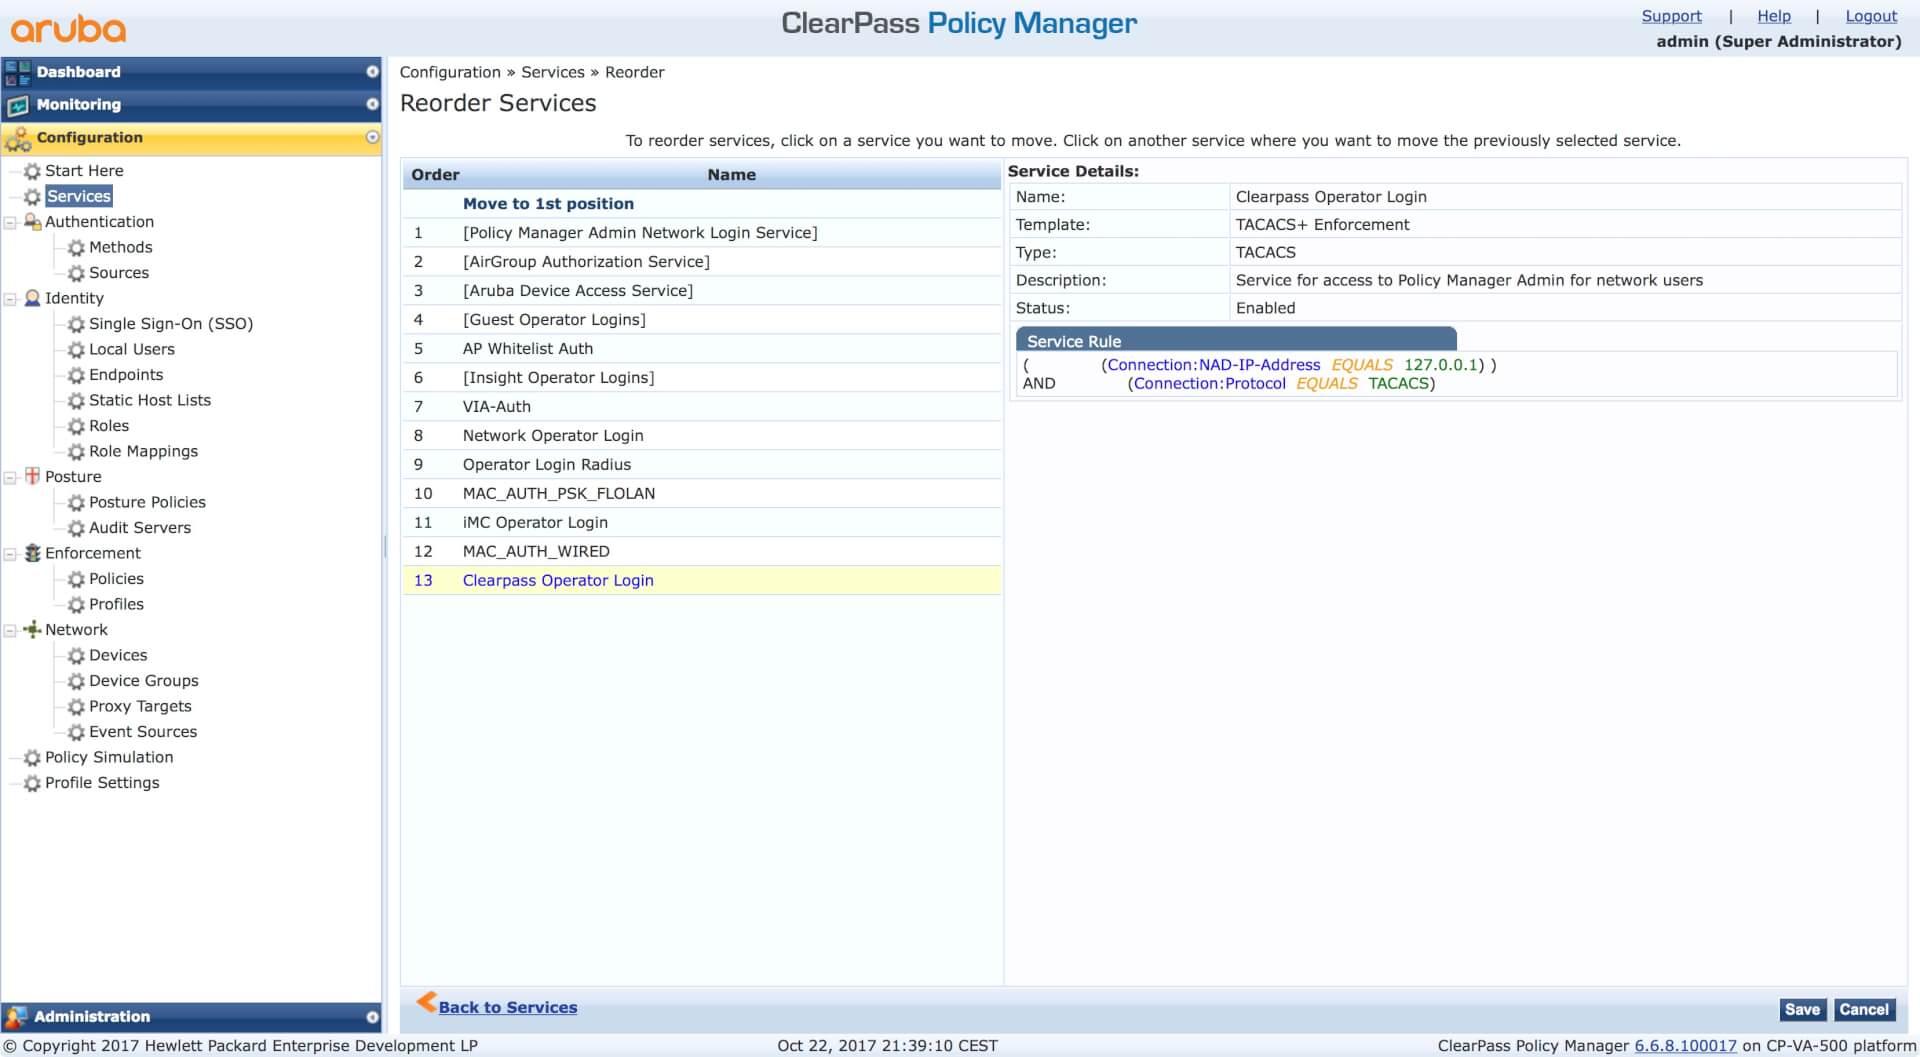 Clearpass Operator Login - Reorder Services List